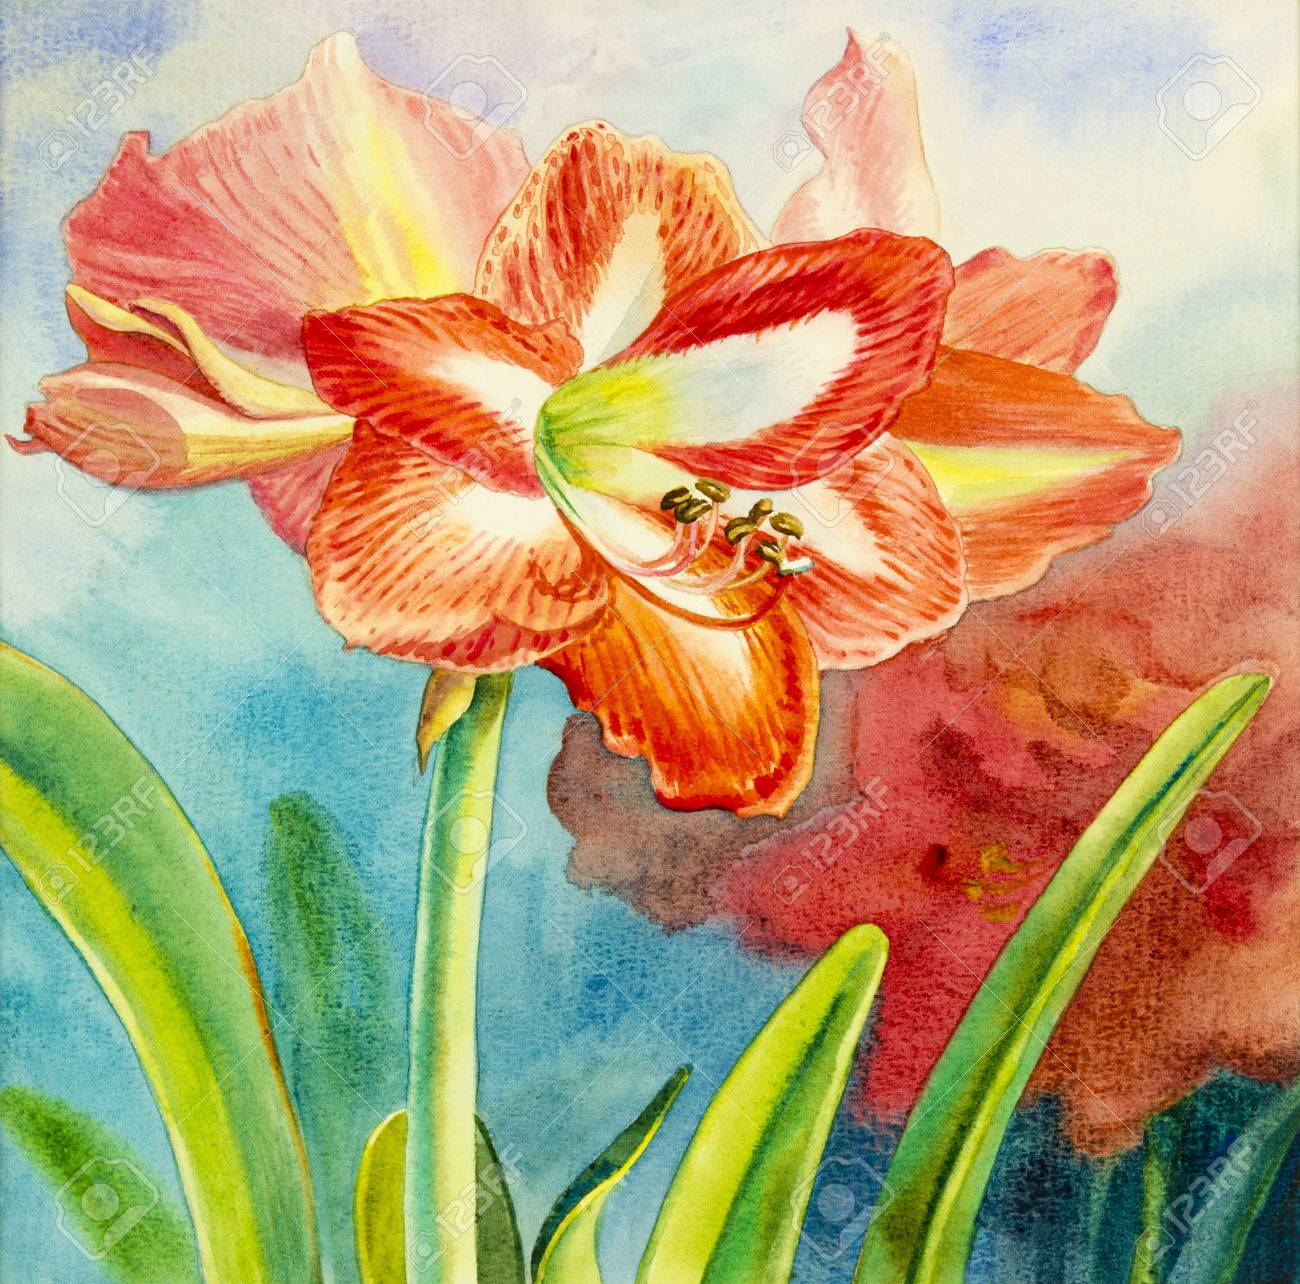 Watercolor Painting Original Realistic Red Flower Of Amaliris